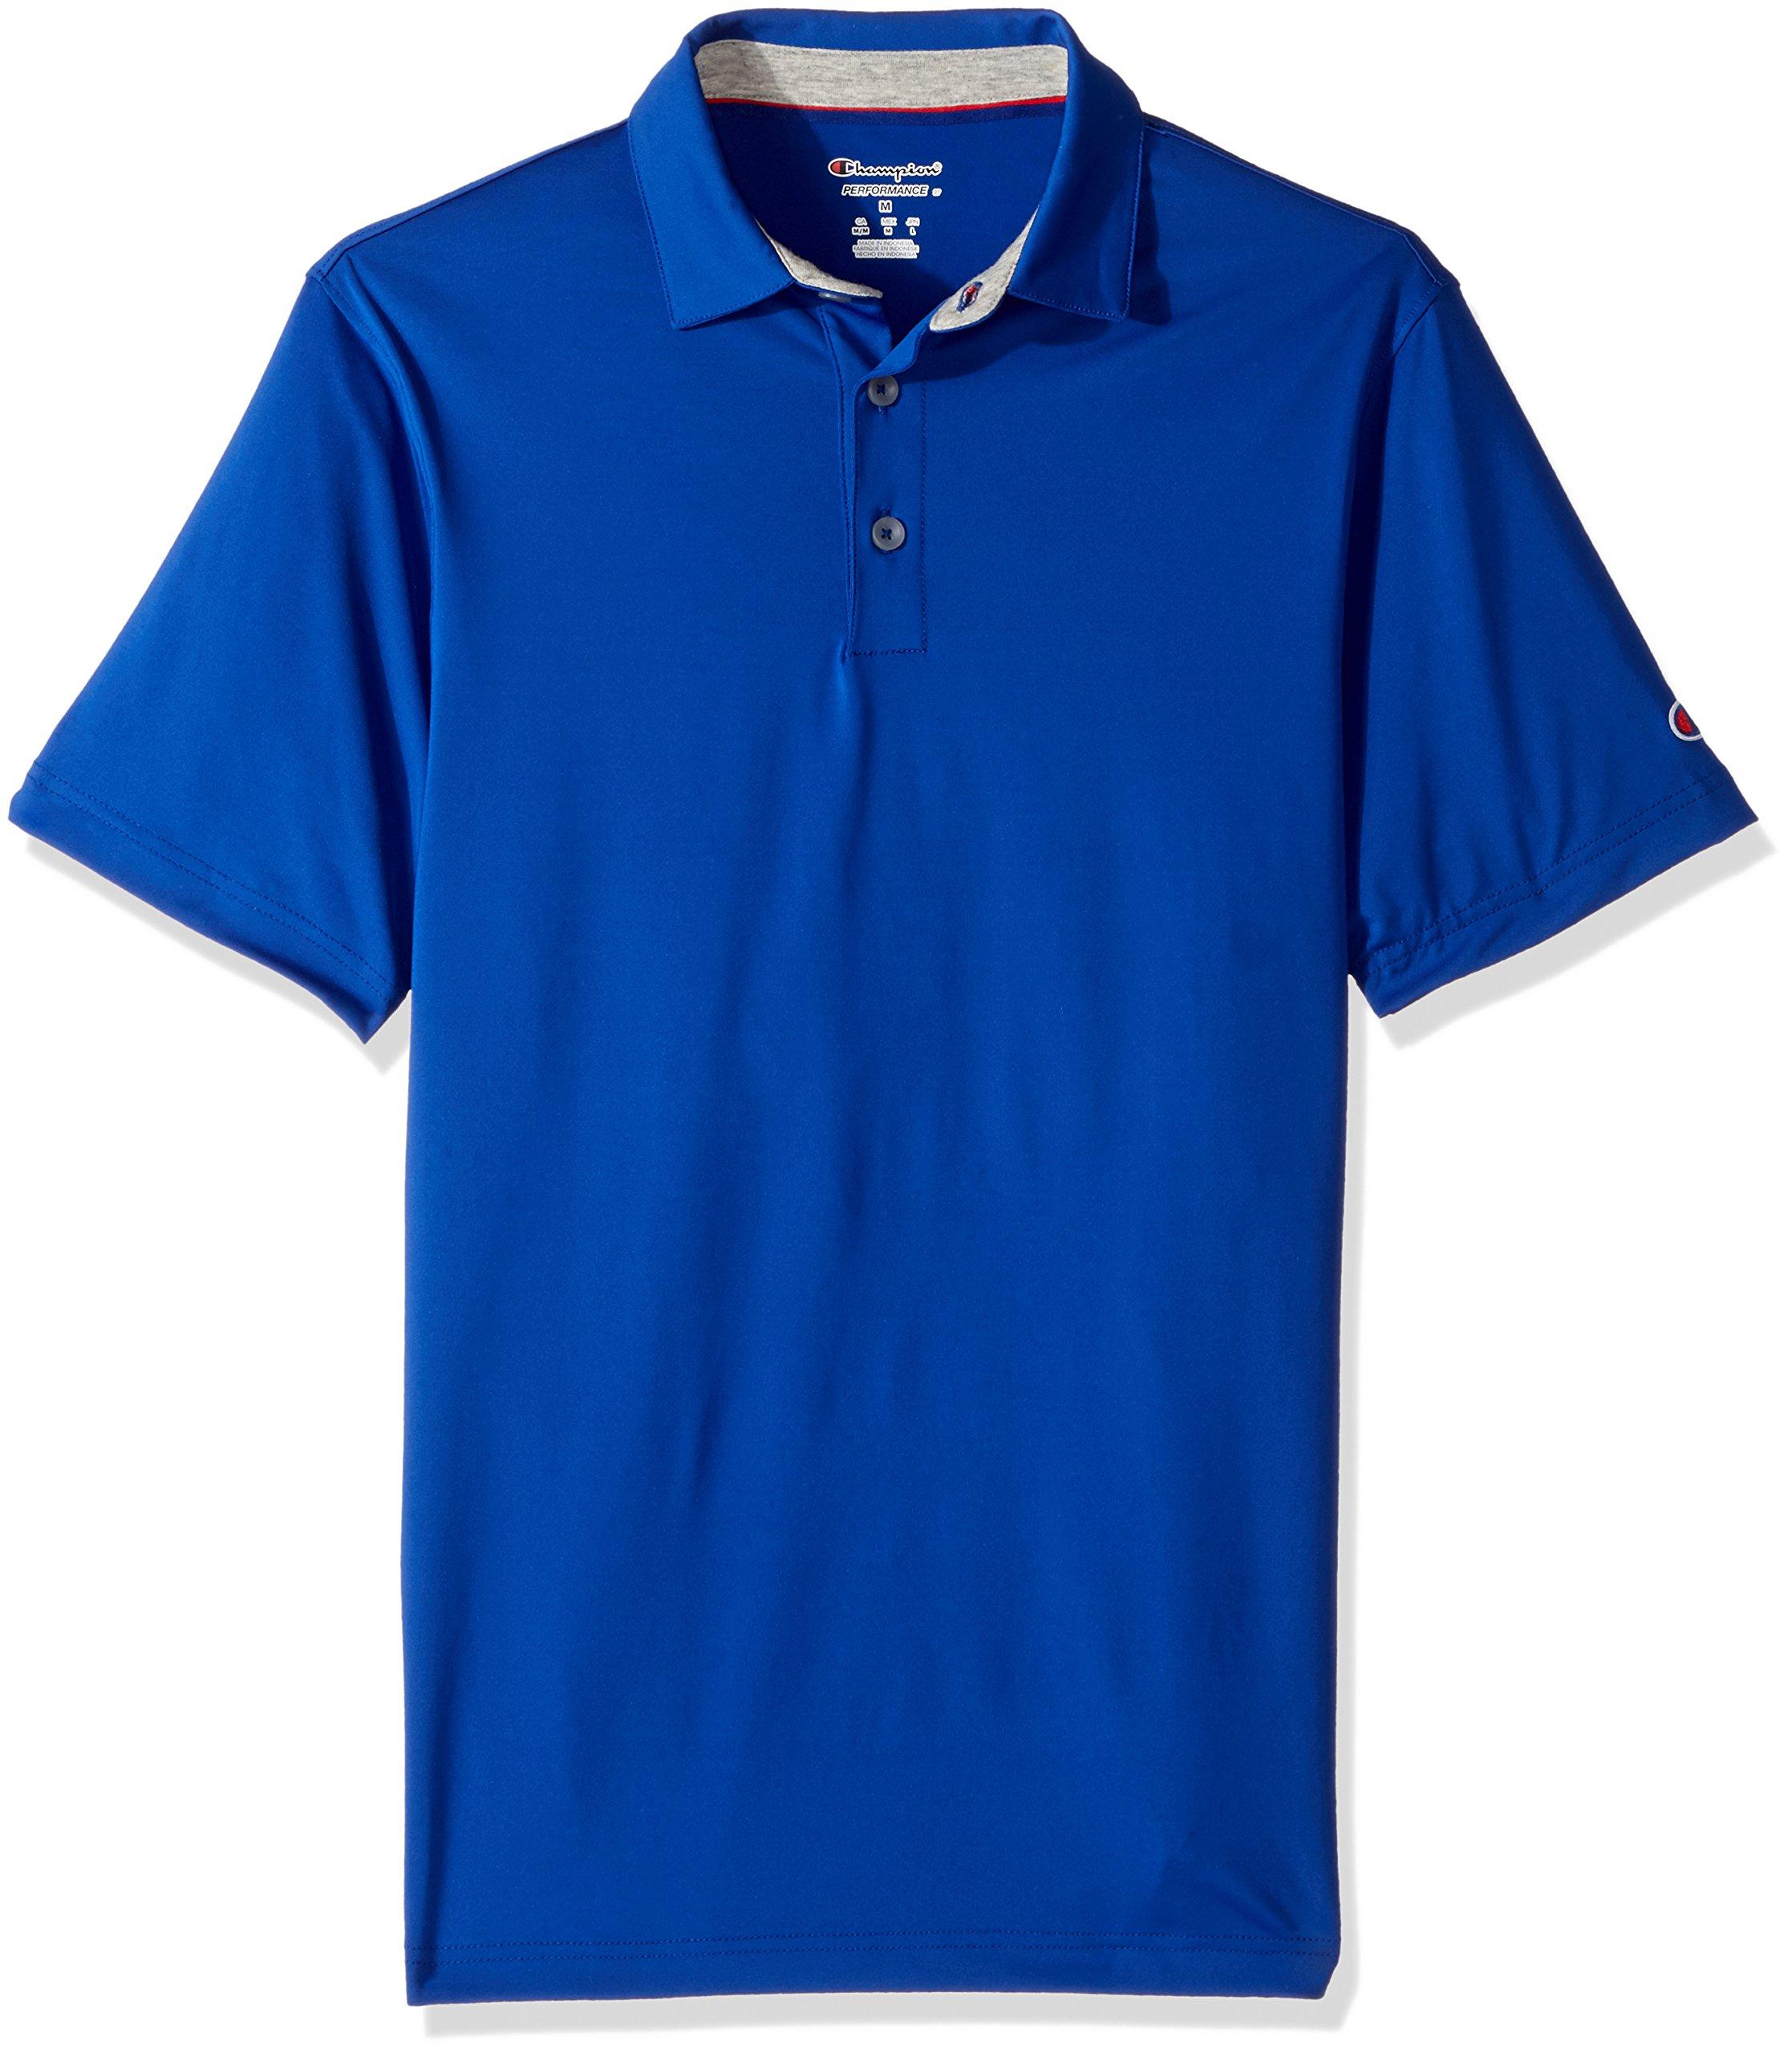 Champion Men's Golf Polo